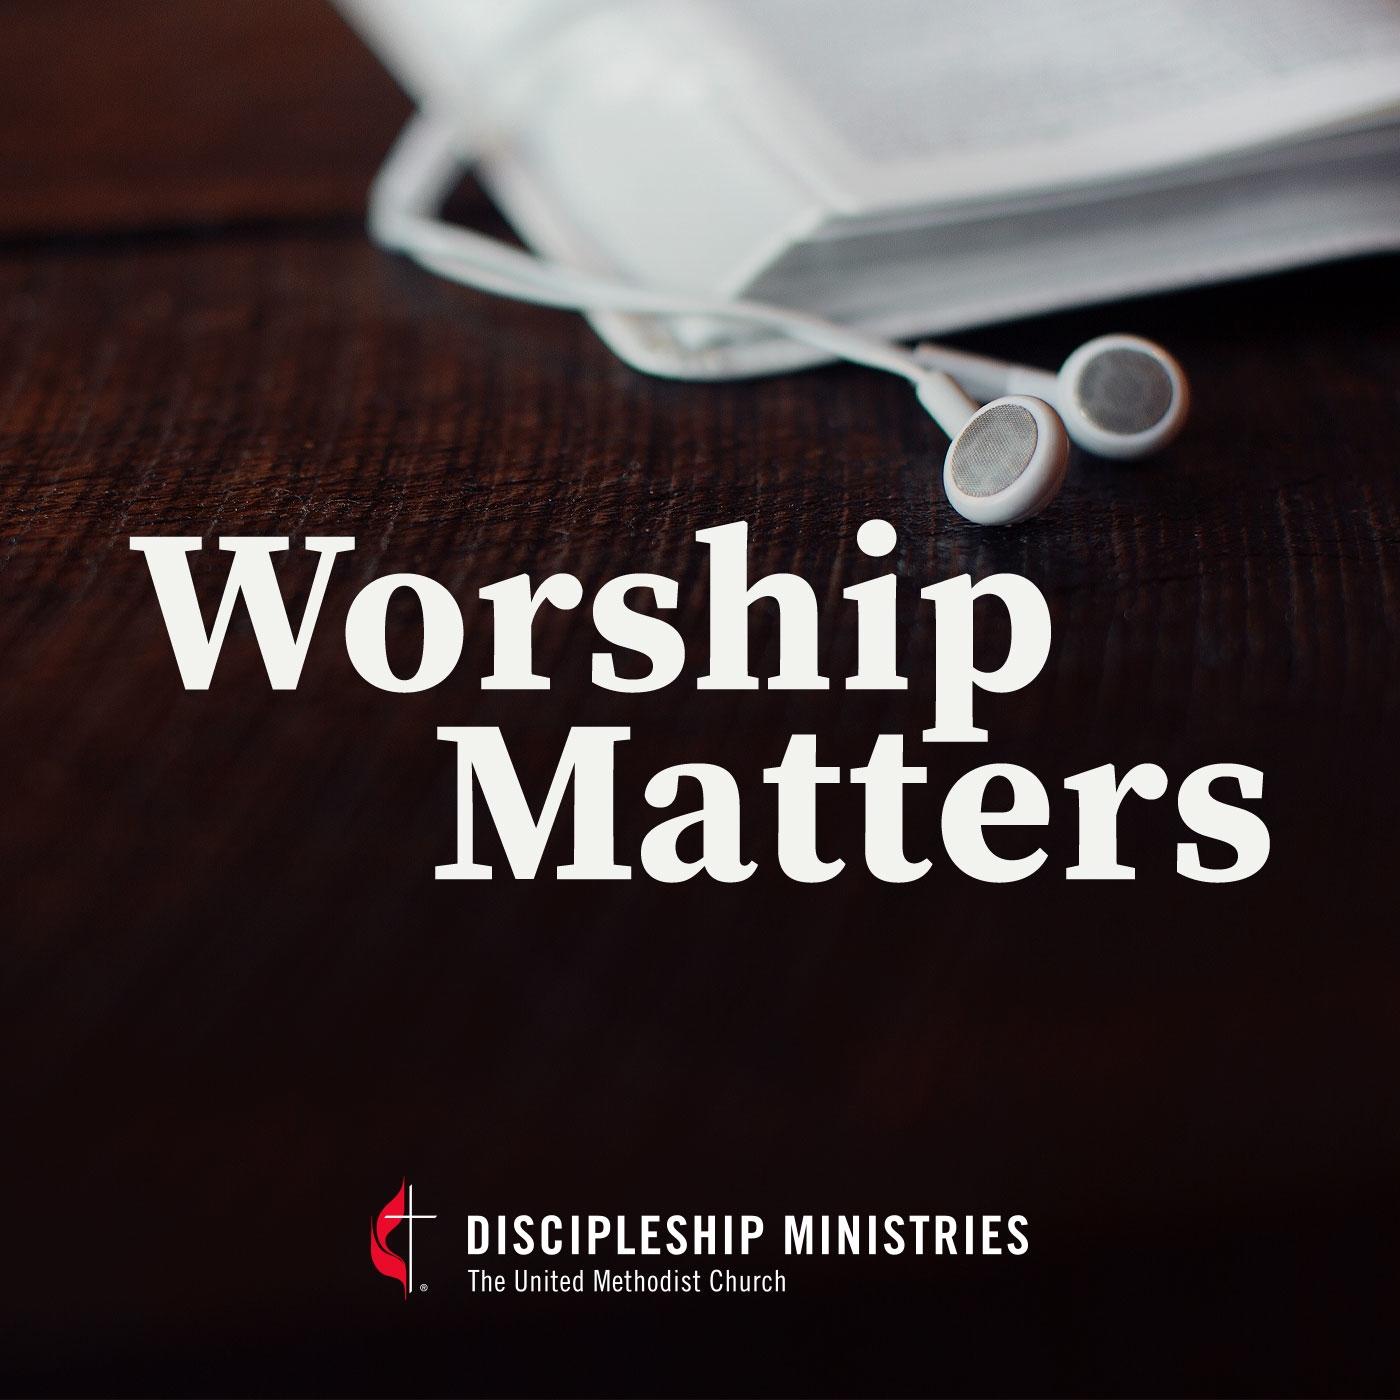 Discipleship Ministries | Worship Matters: Episode 01 - Epiphany  Umc Calendar Lectionary